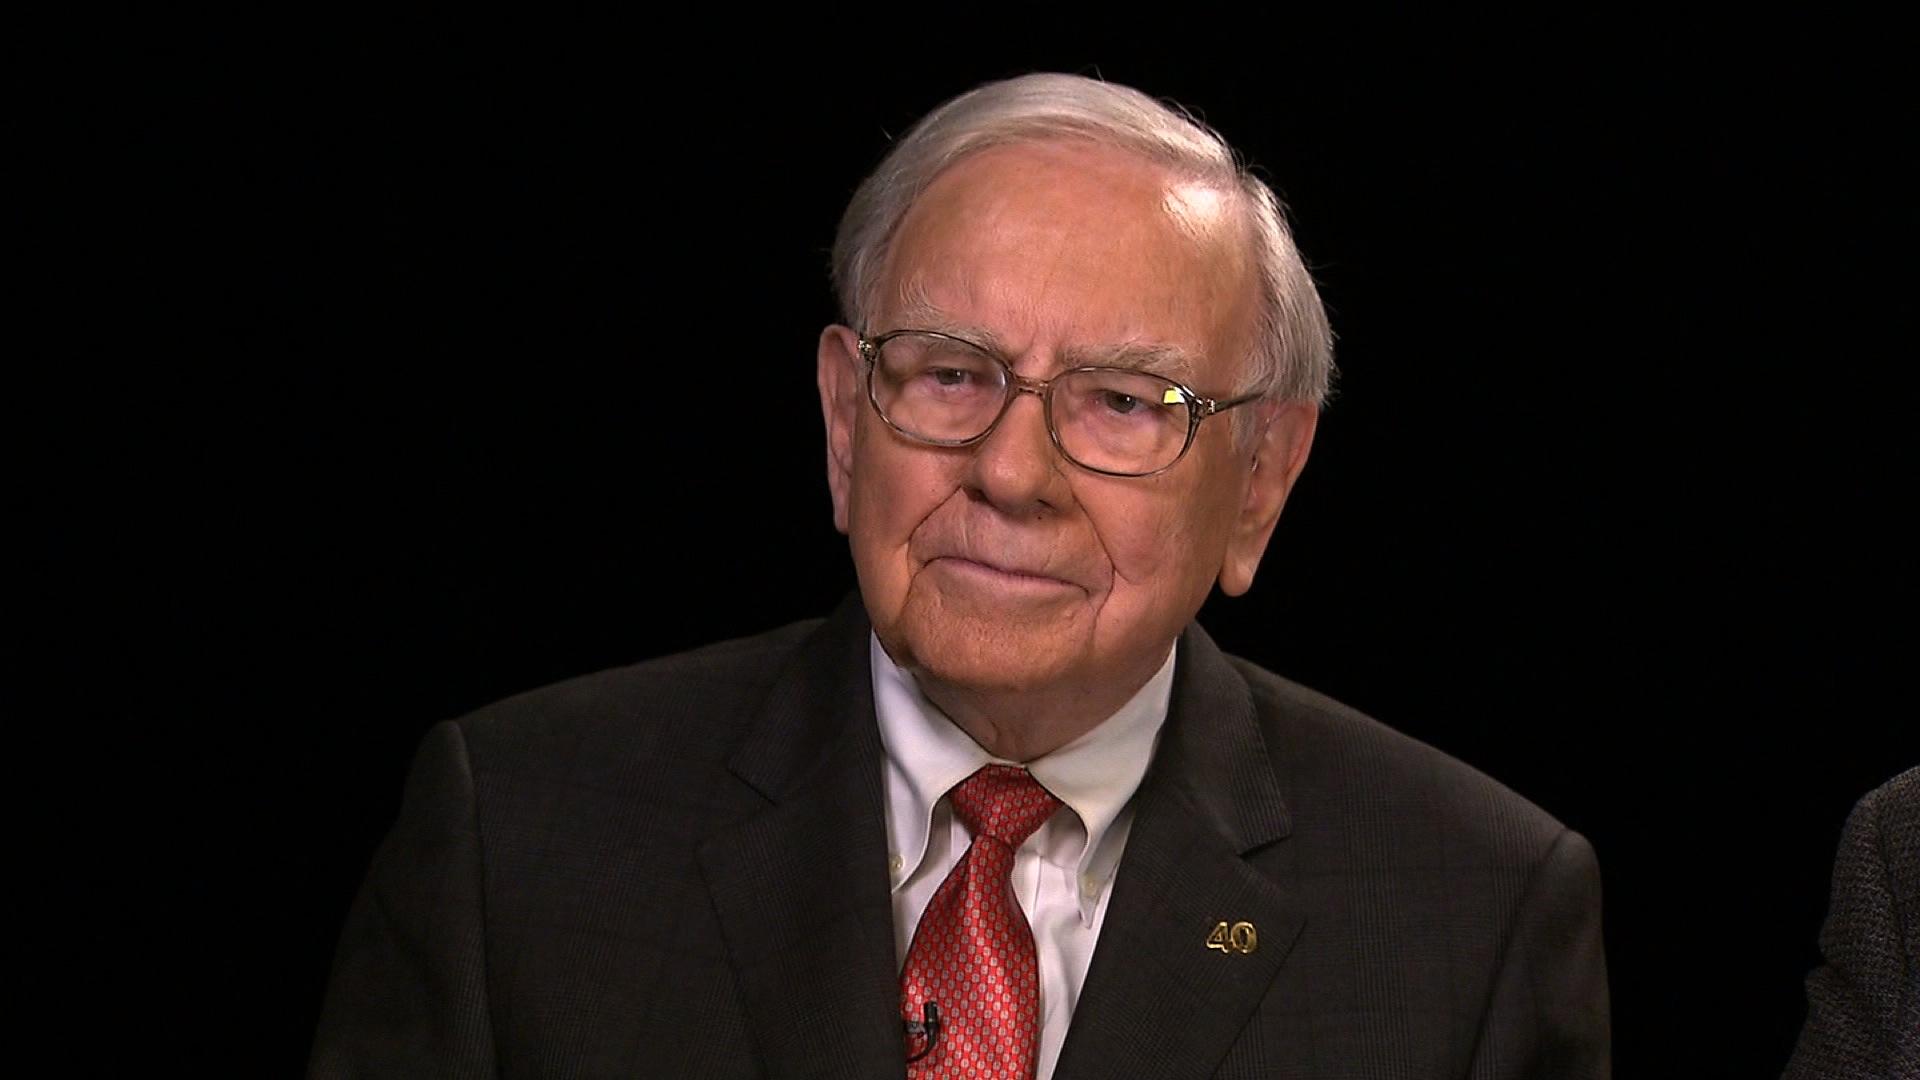 Warren Buffet Offering $1 Billion For Perfect March Madness Bracket